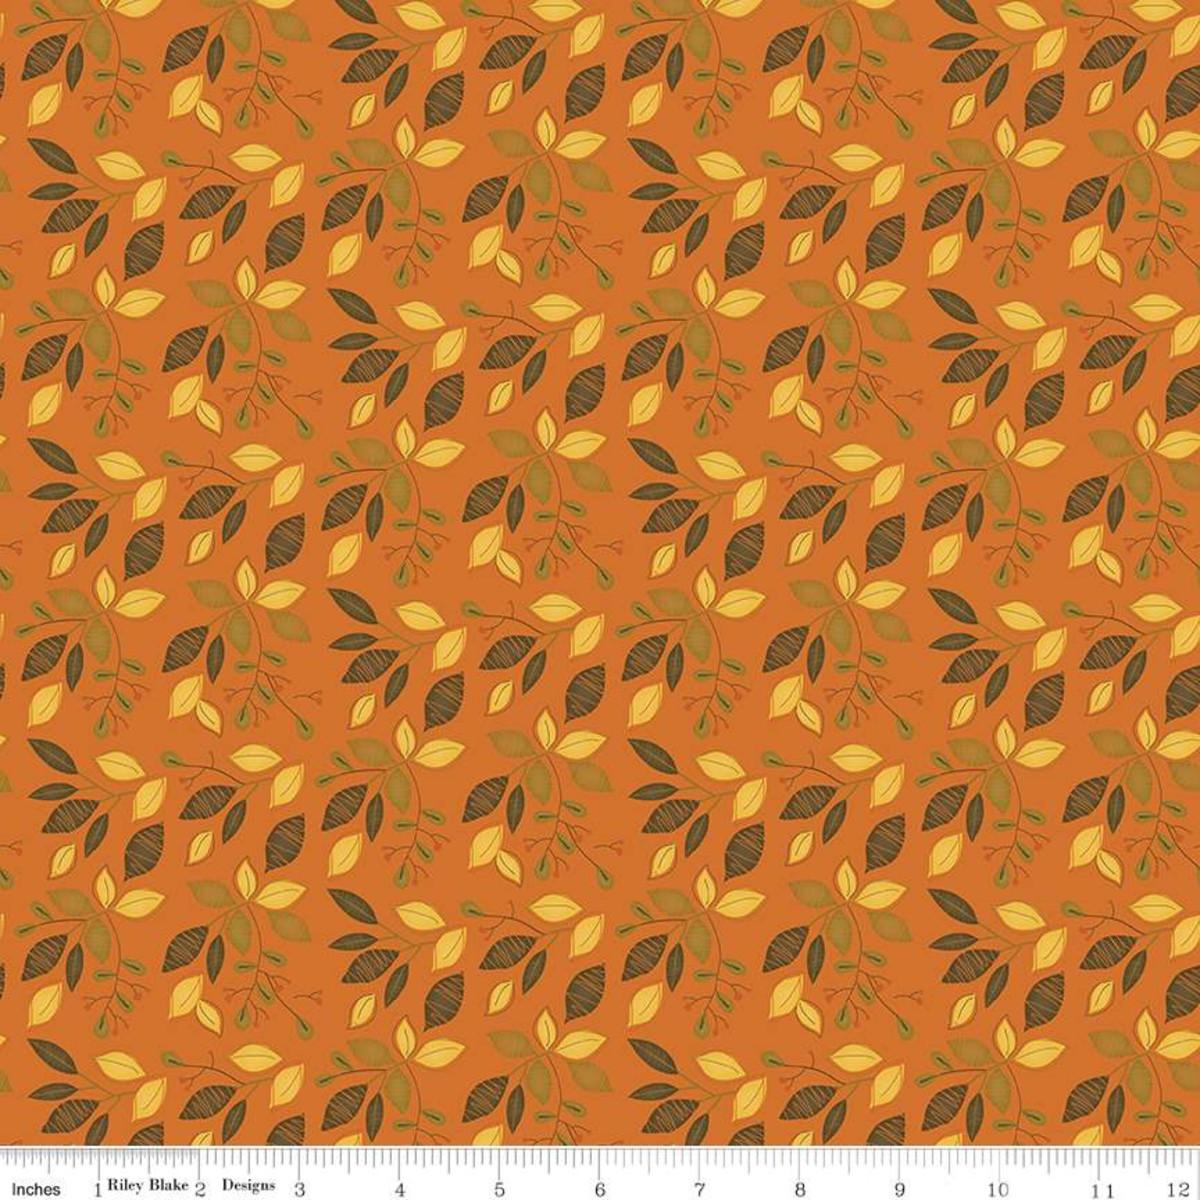 Adel in Autumn #C10822 Orange by Riley Blake